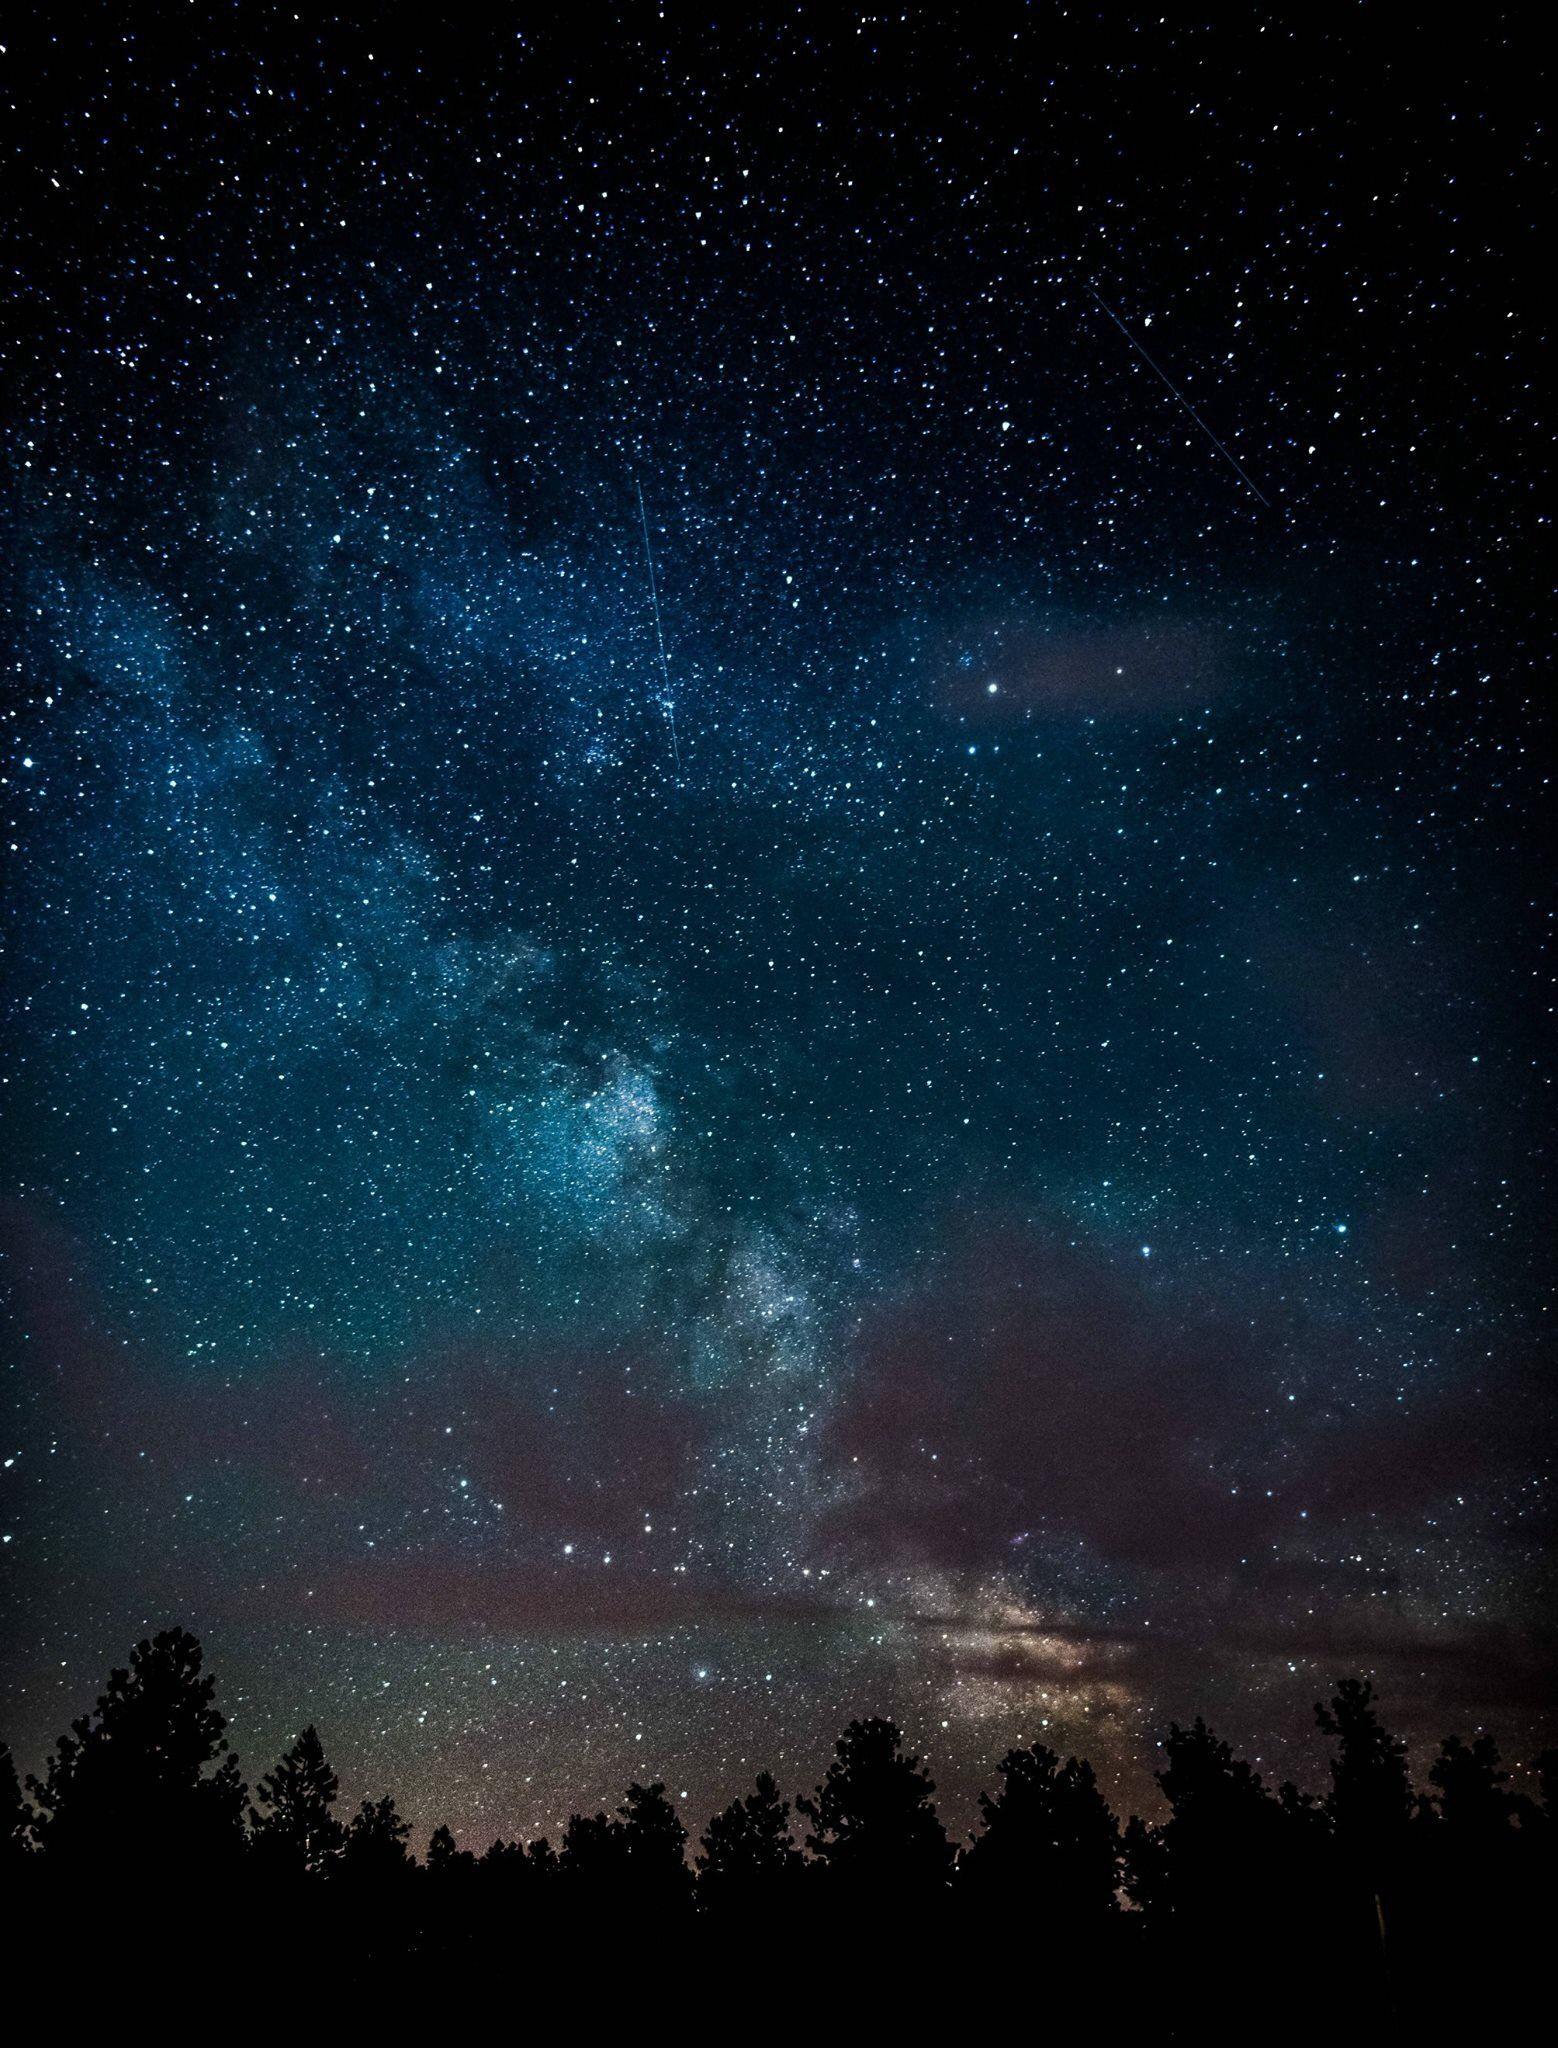 Night sky & silhouette of the trees